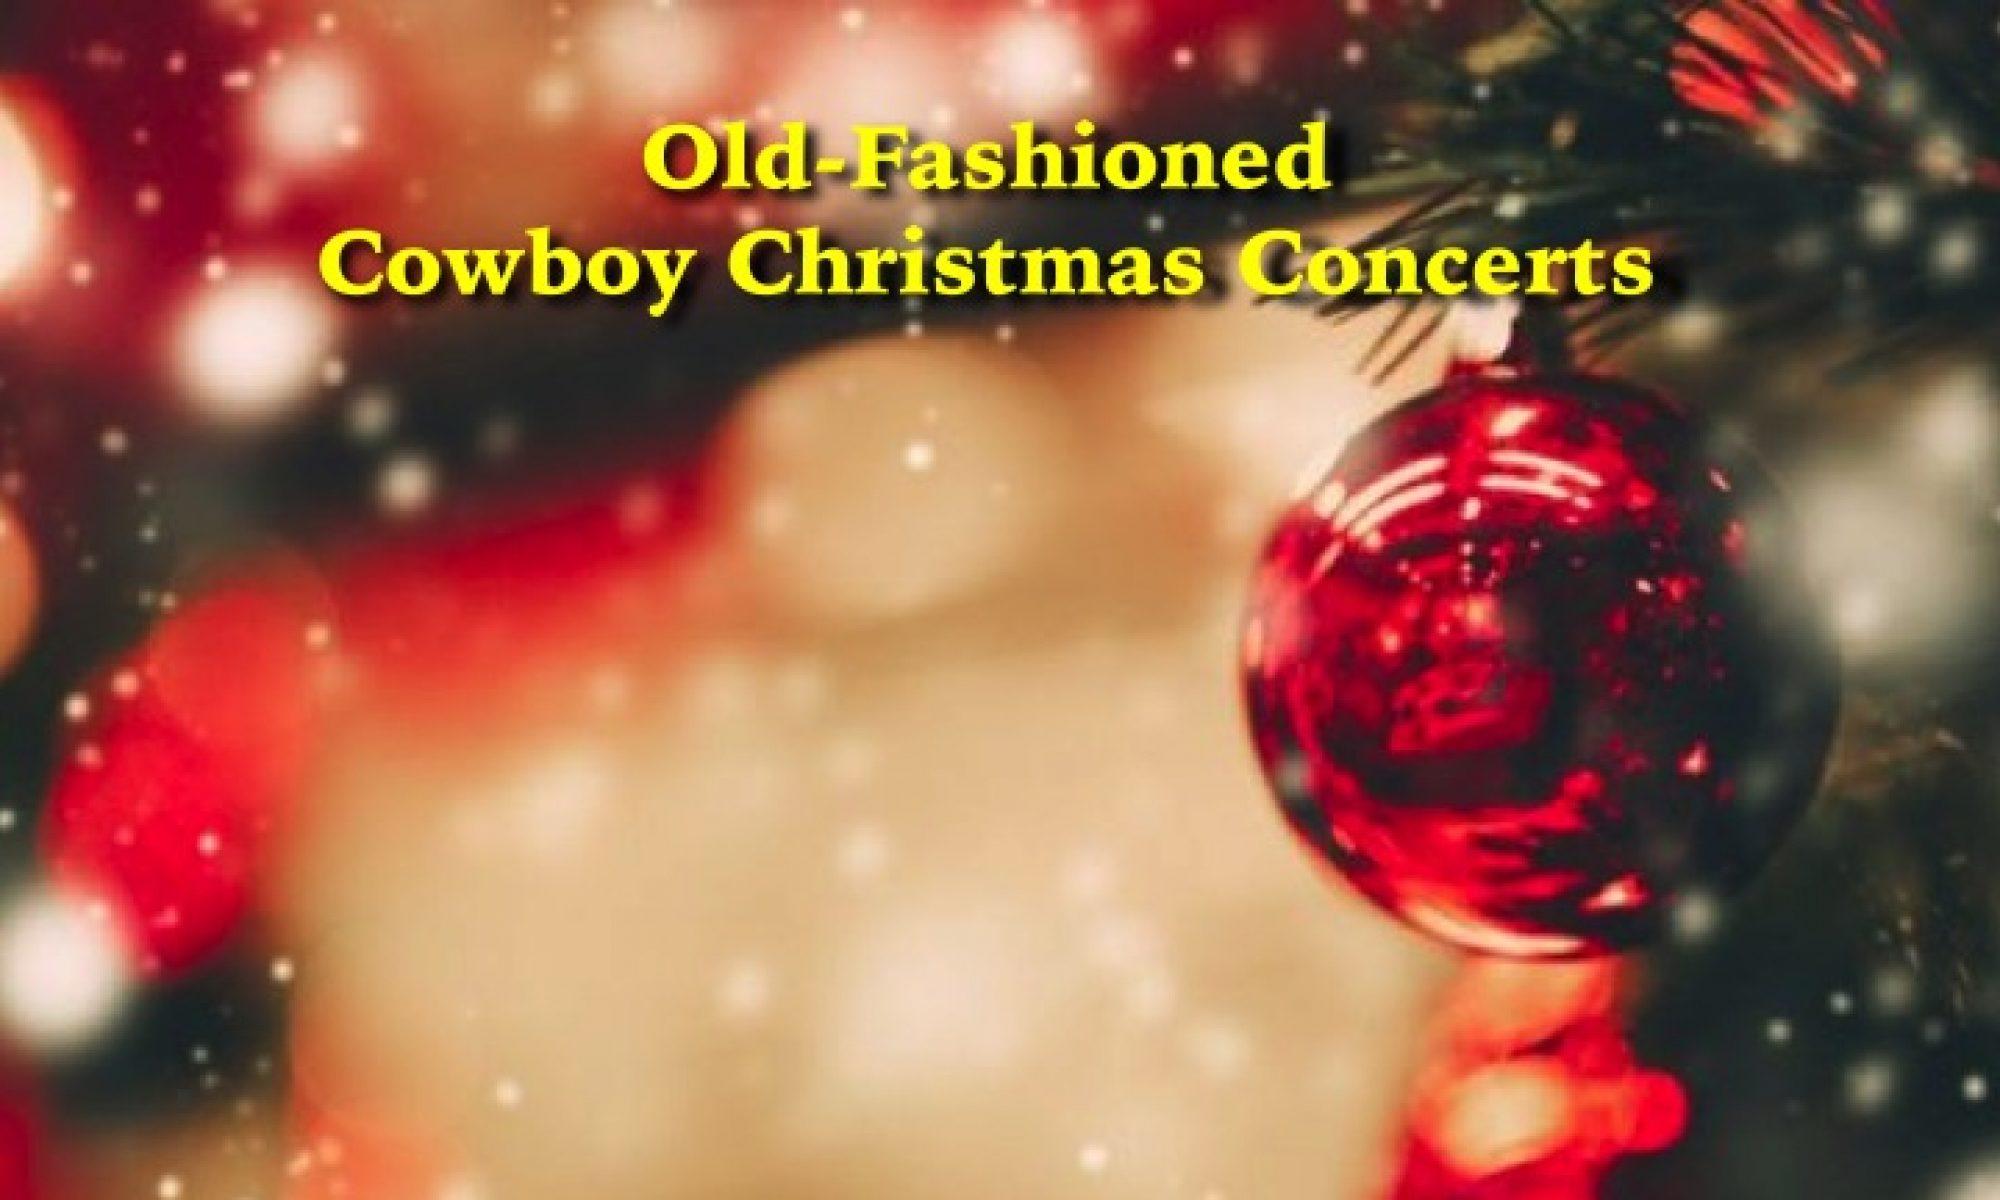 Cowboy Christmas Concerts